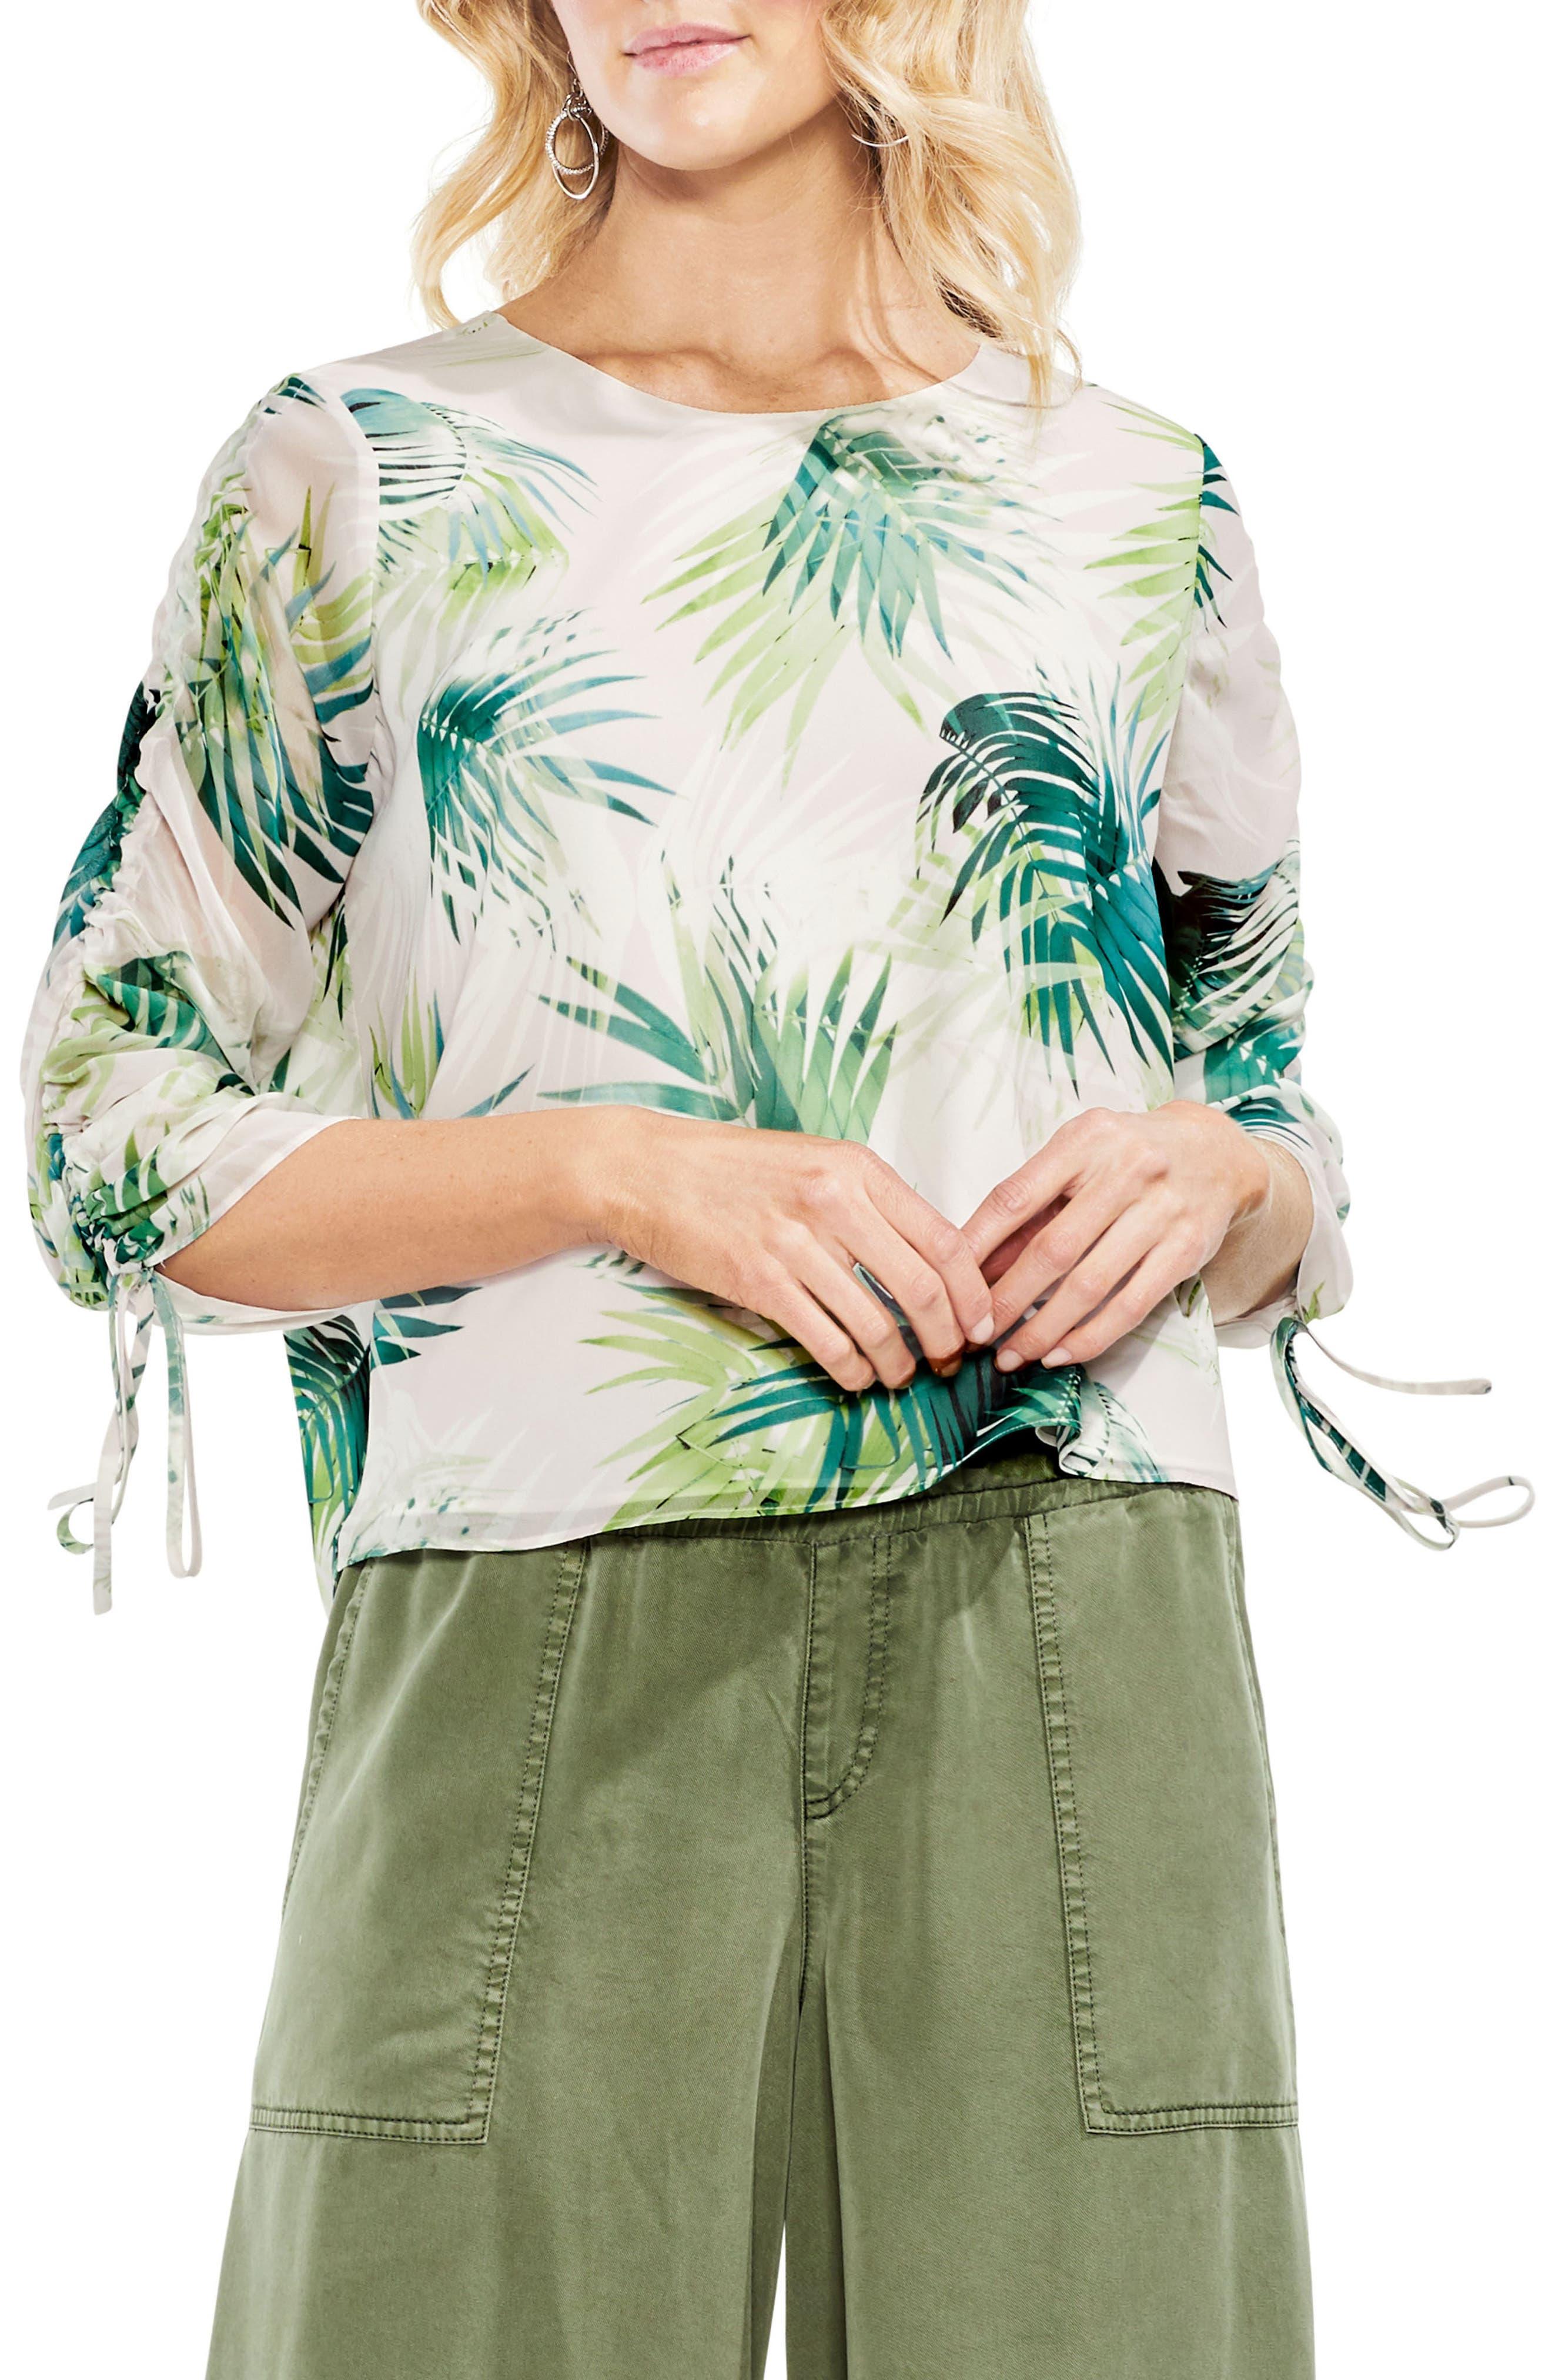 Drawstring Sleeve Sunlit Palm Print Top,                             Main thumbnail 1, color,                             300